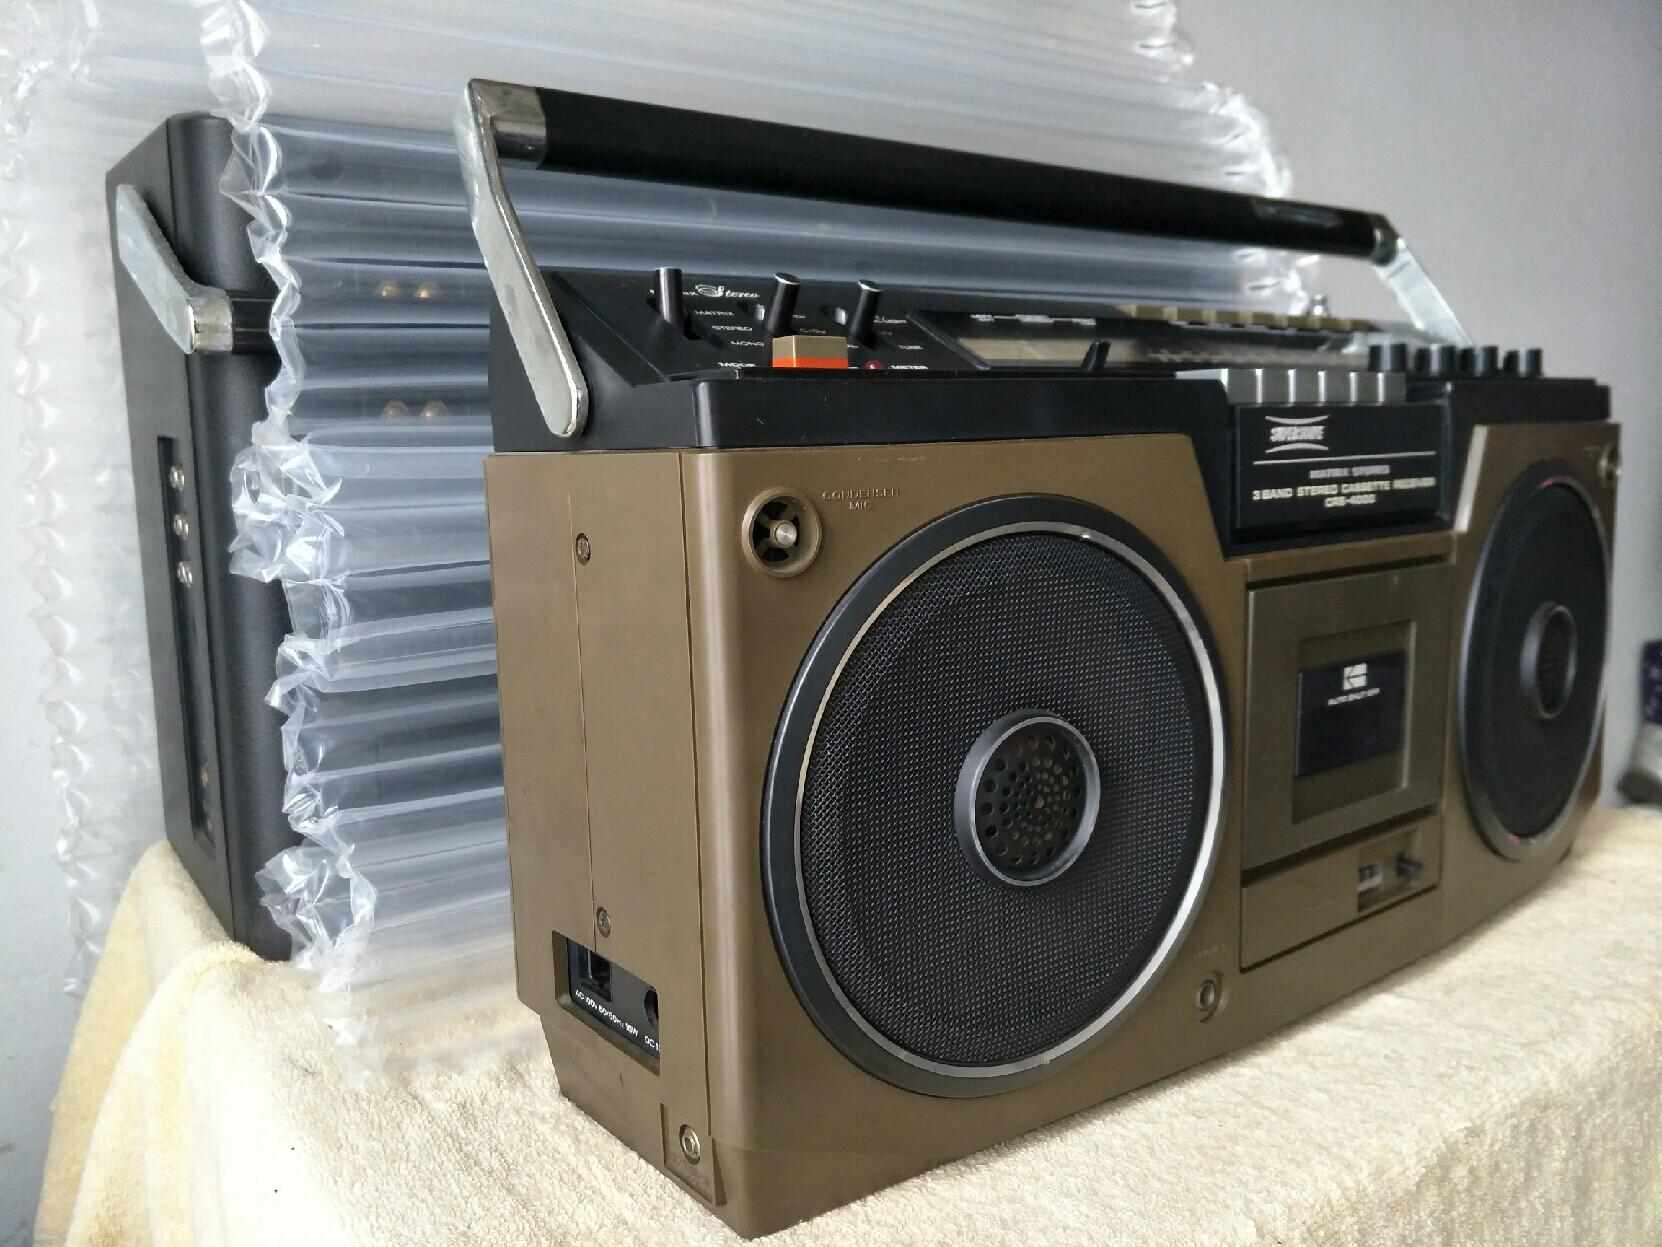 товар из китая 马兰士crs-4000收录机